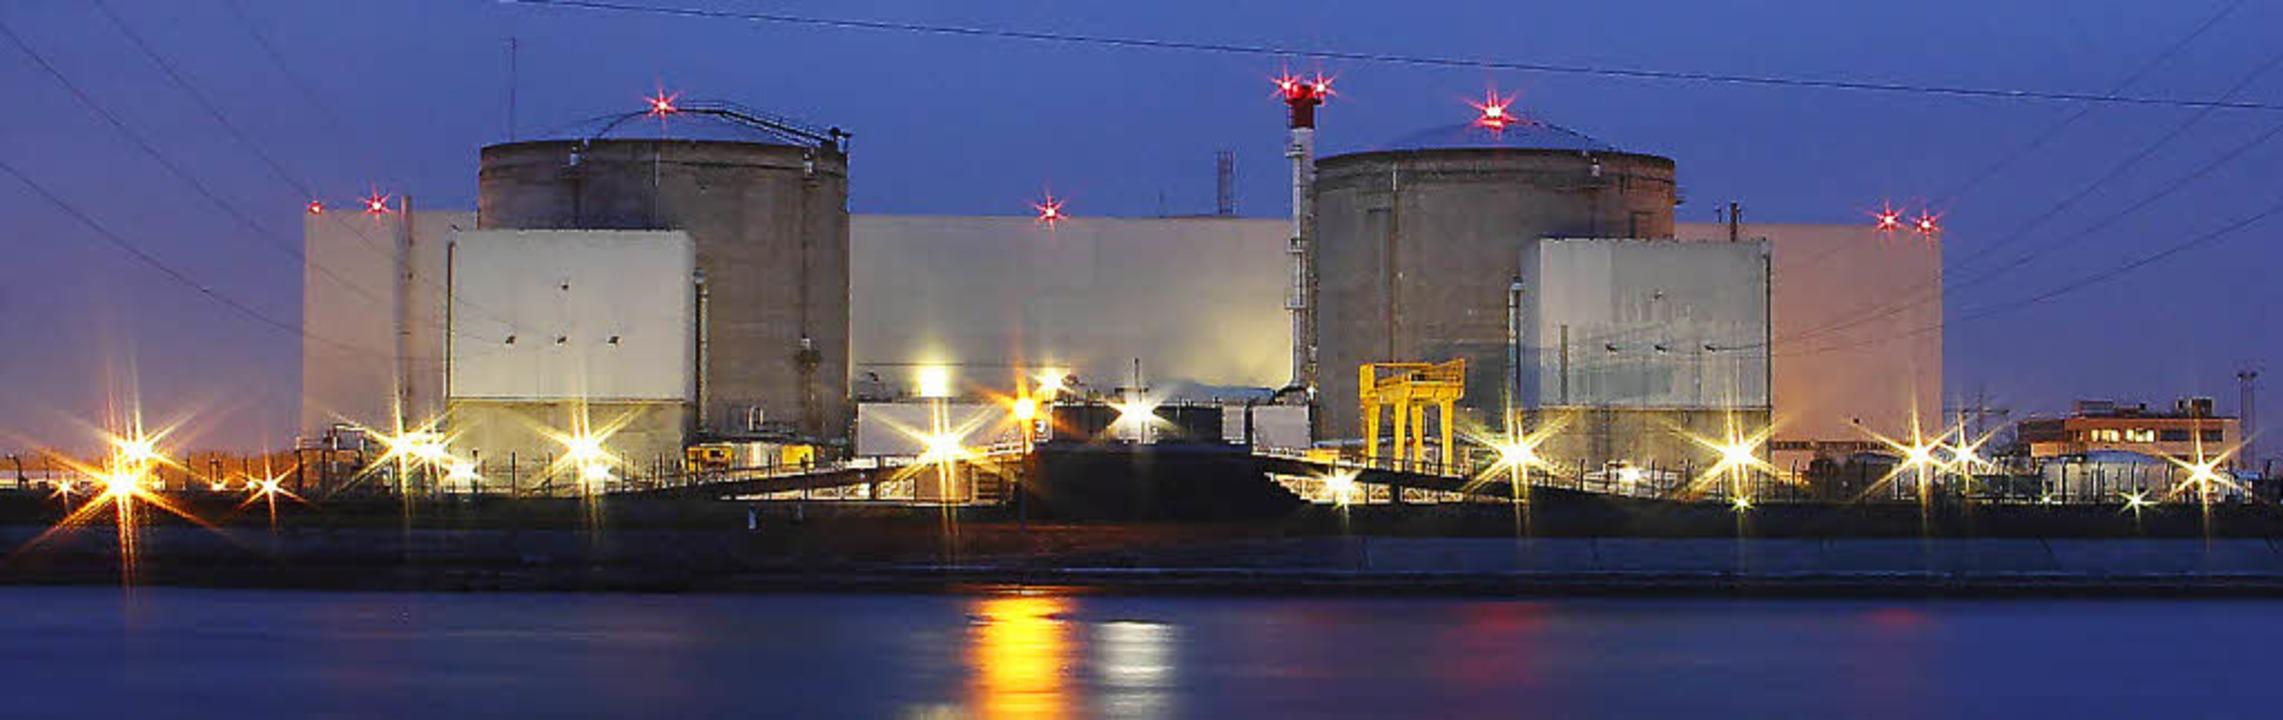 Das Atomkraftwerk Fessenheim   | Foto: afp/hans-peter Ziesmer/Serge Ollivier